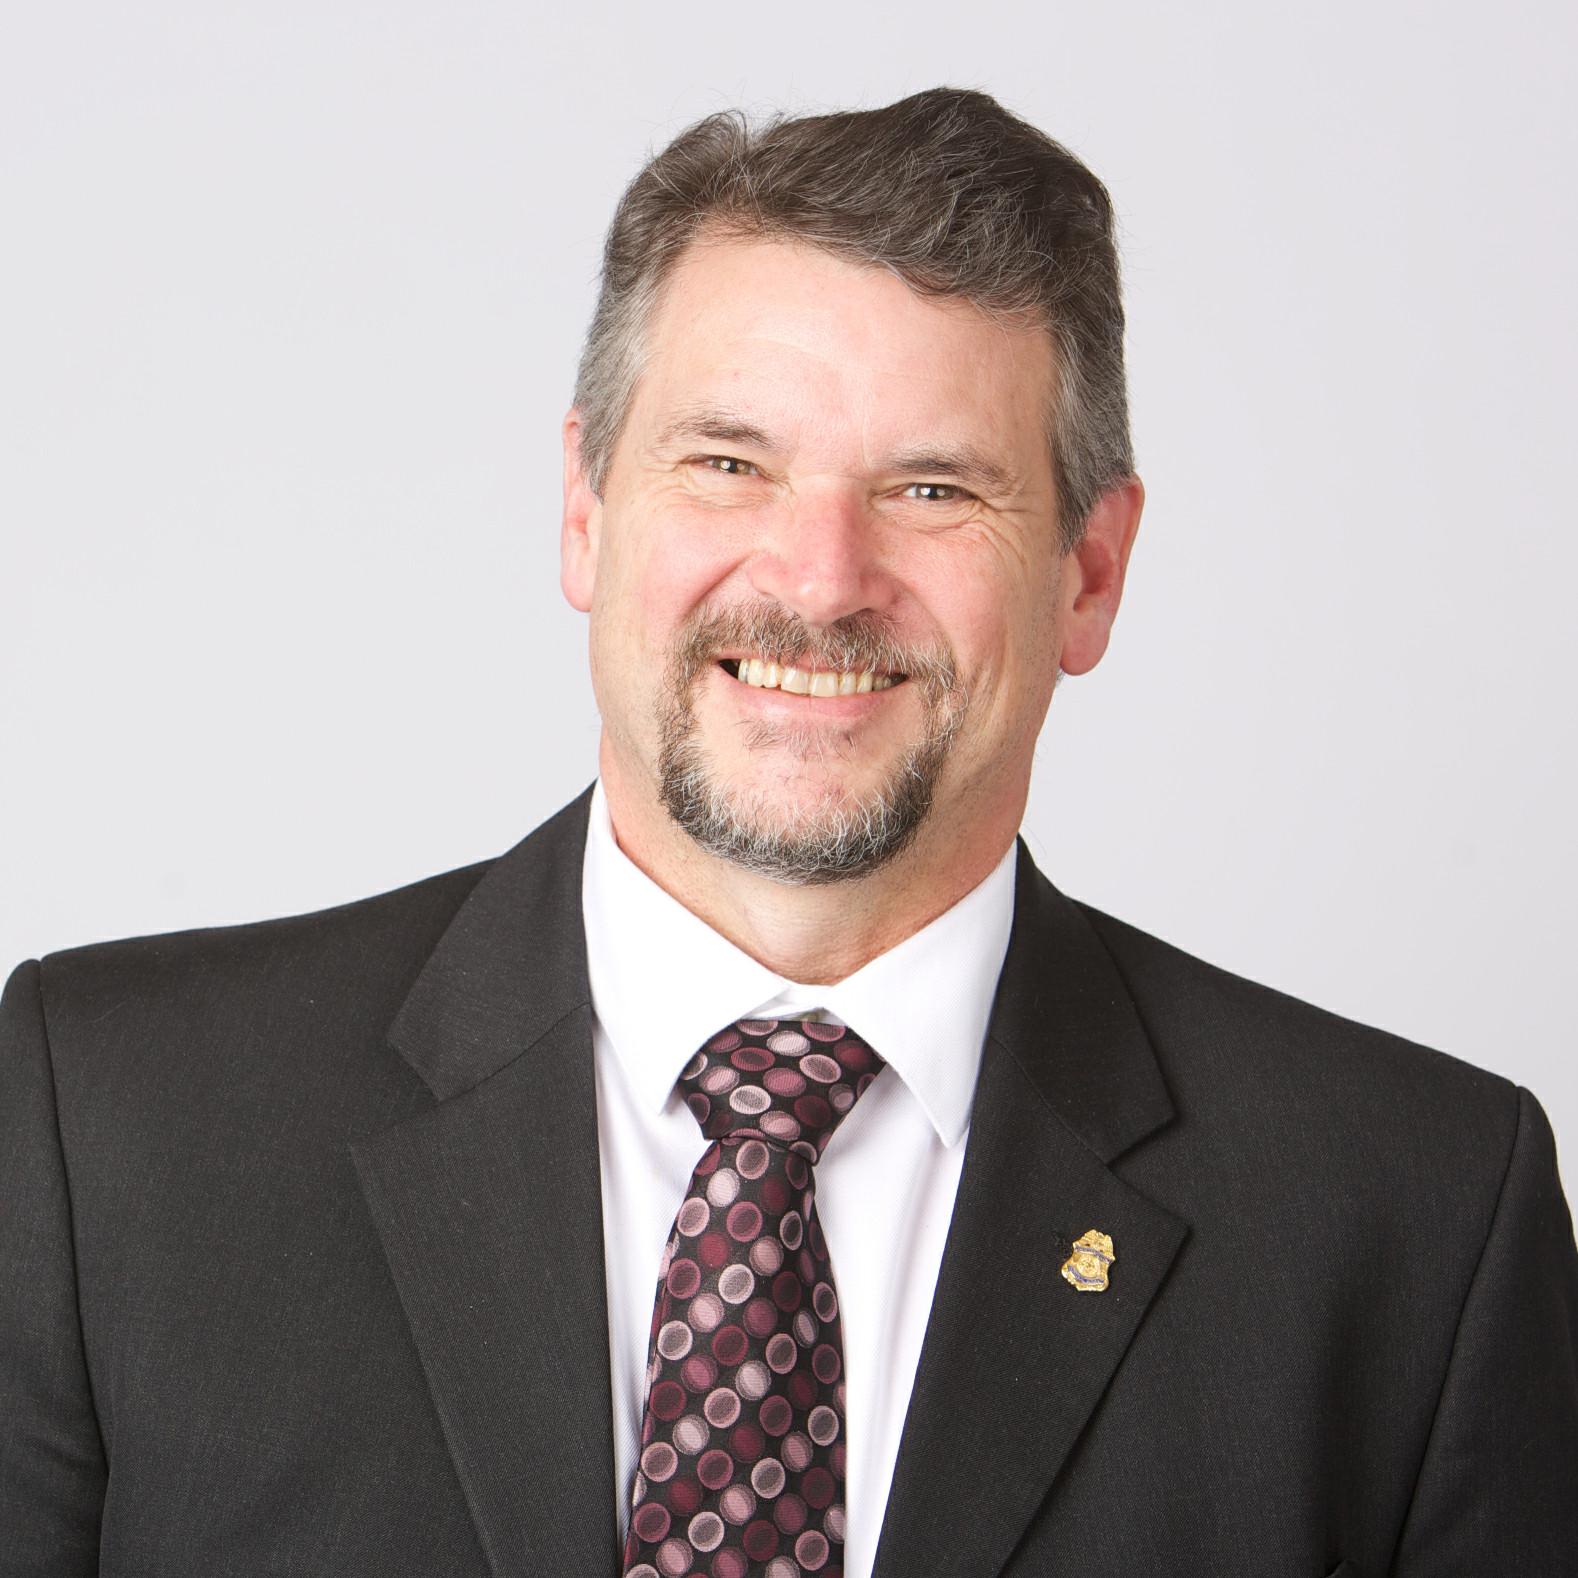 Jeff McElravy, AIA